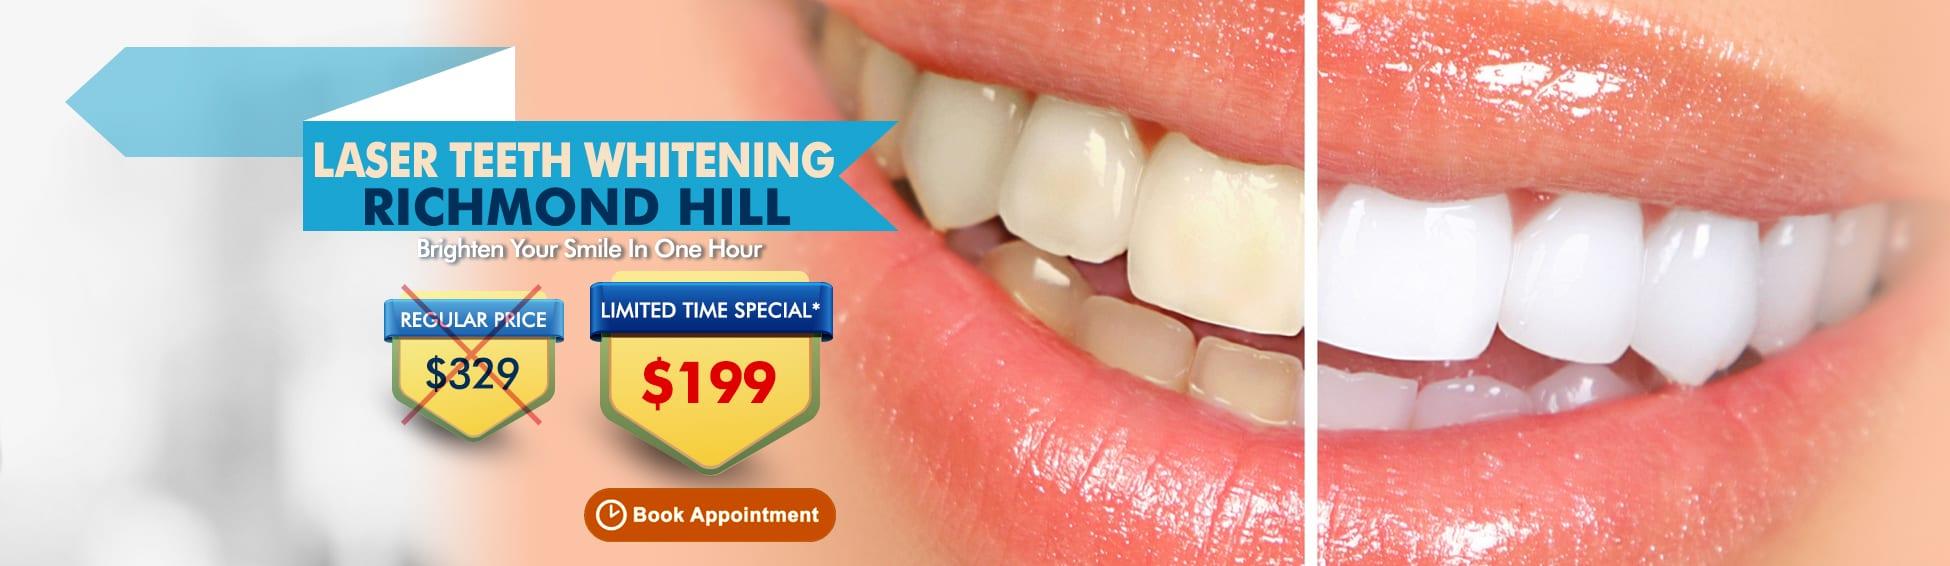 Laser Teeth Whitening Richmond Hill Ontario - $329 $199 _Richmond HIll